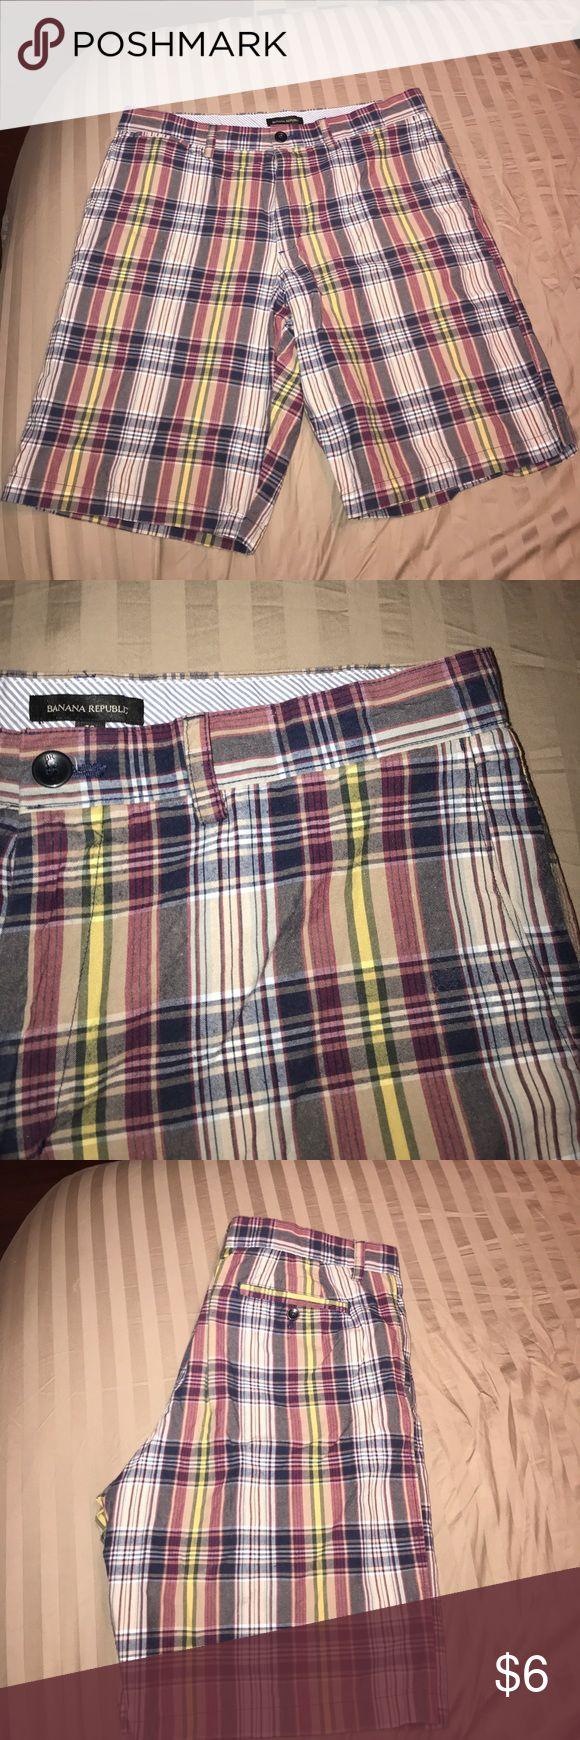 Men's plaid shorts EUC Banana Republic Shorts. Great burgundy plaid. Zipper fly and button closure. Fast shipping Banana Republic Shorts